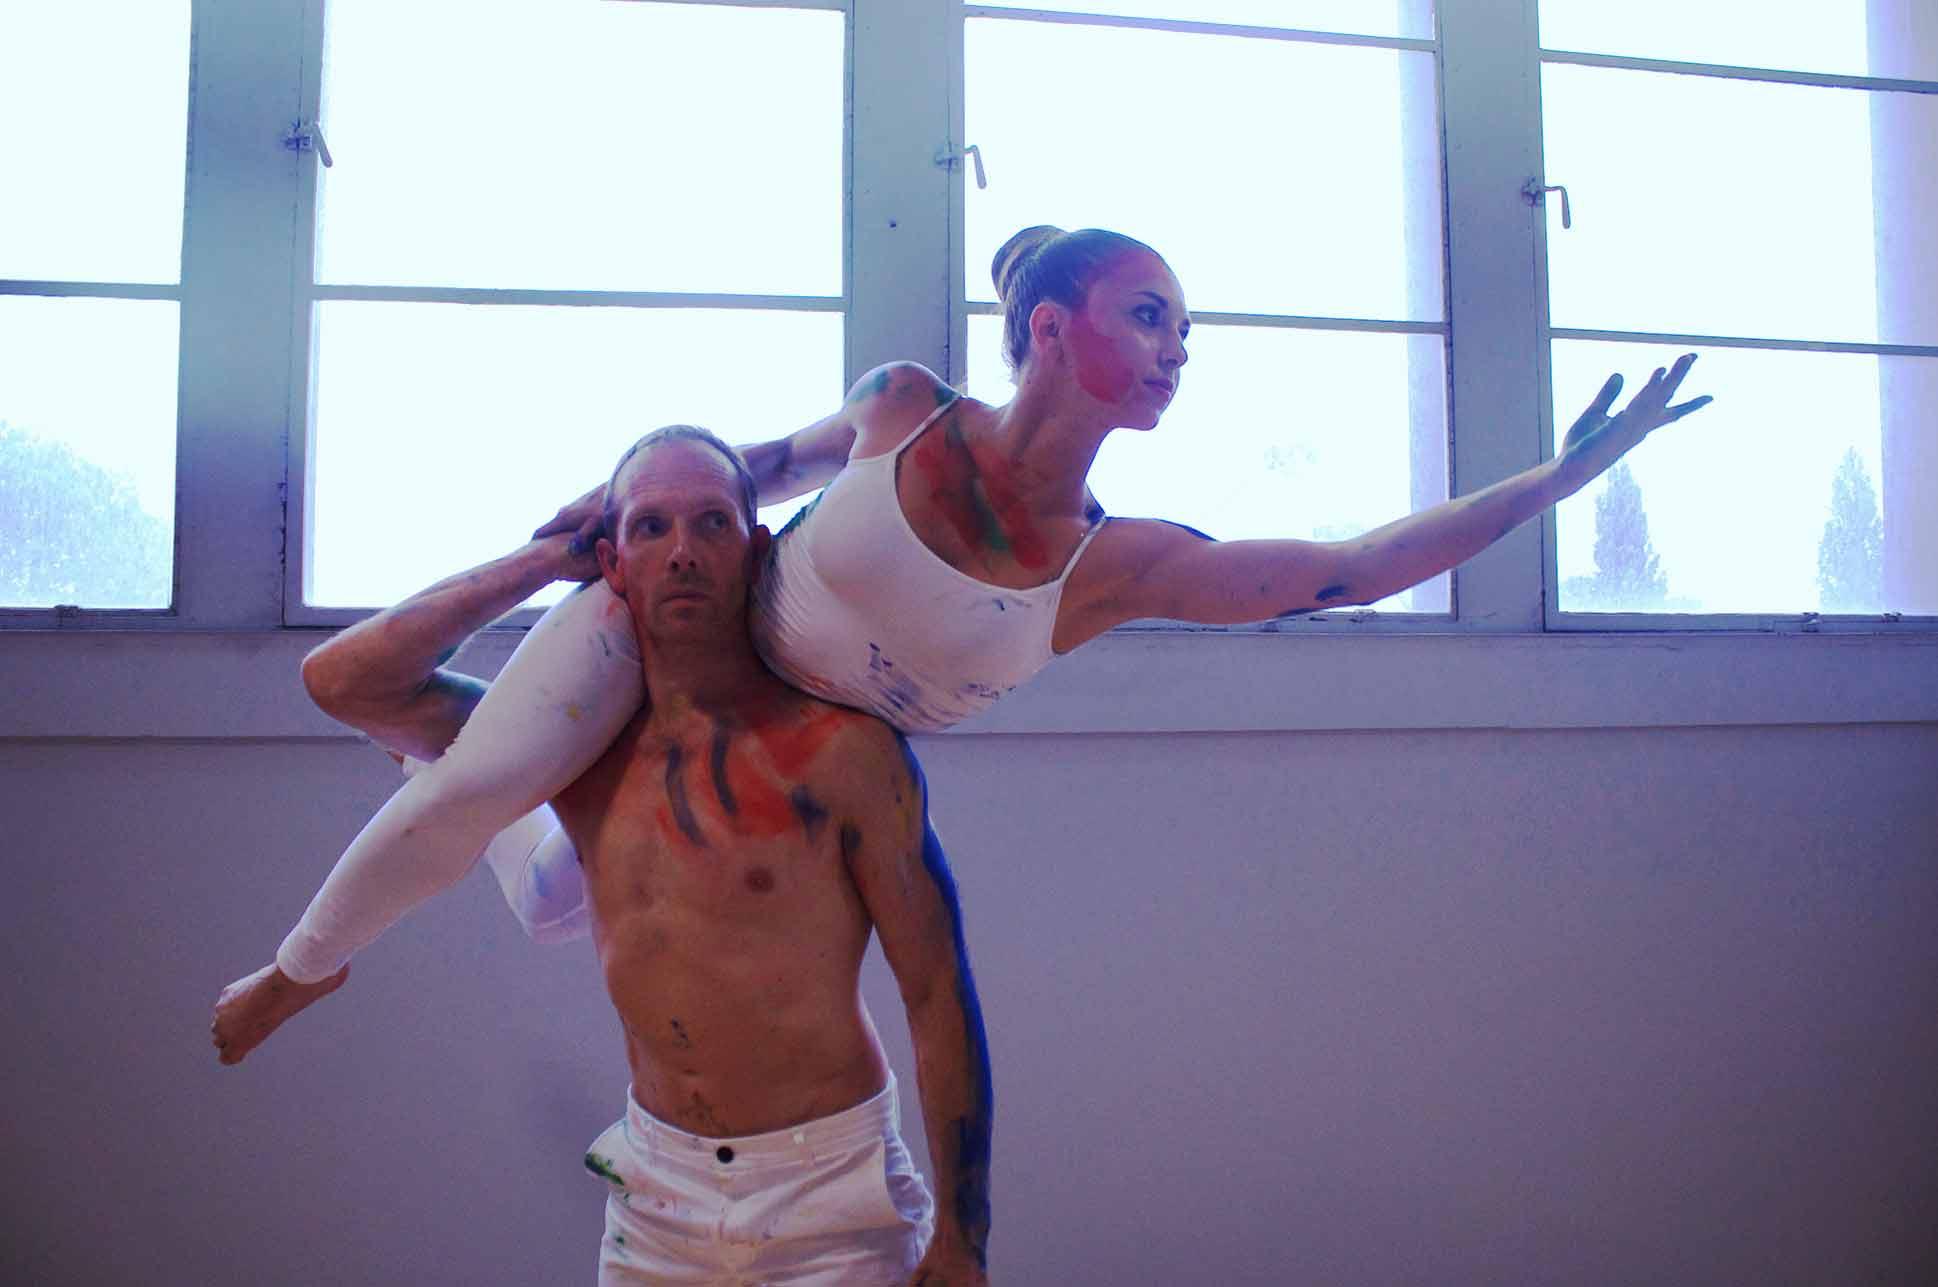 Compagnie_NEWA_acrobatiek_handtohand_balance_duo_loreal